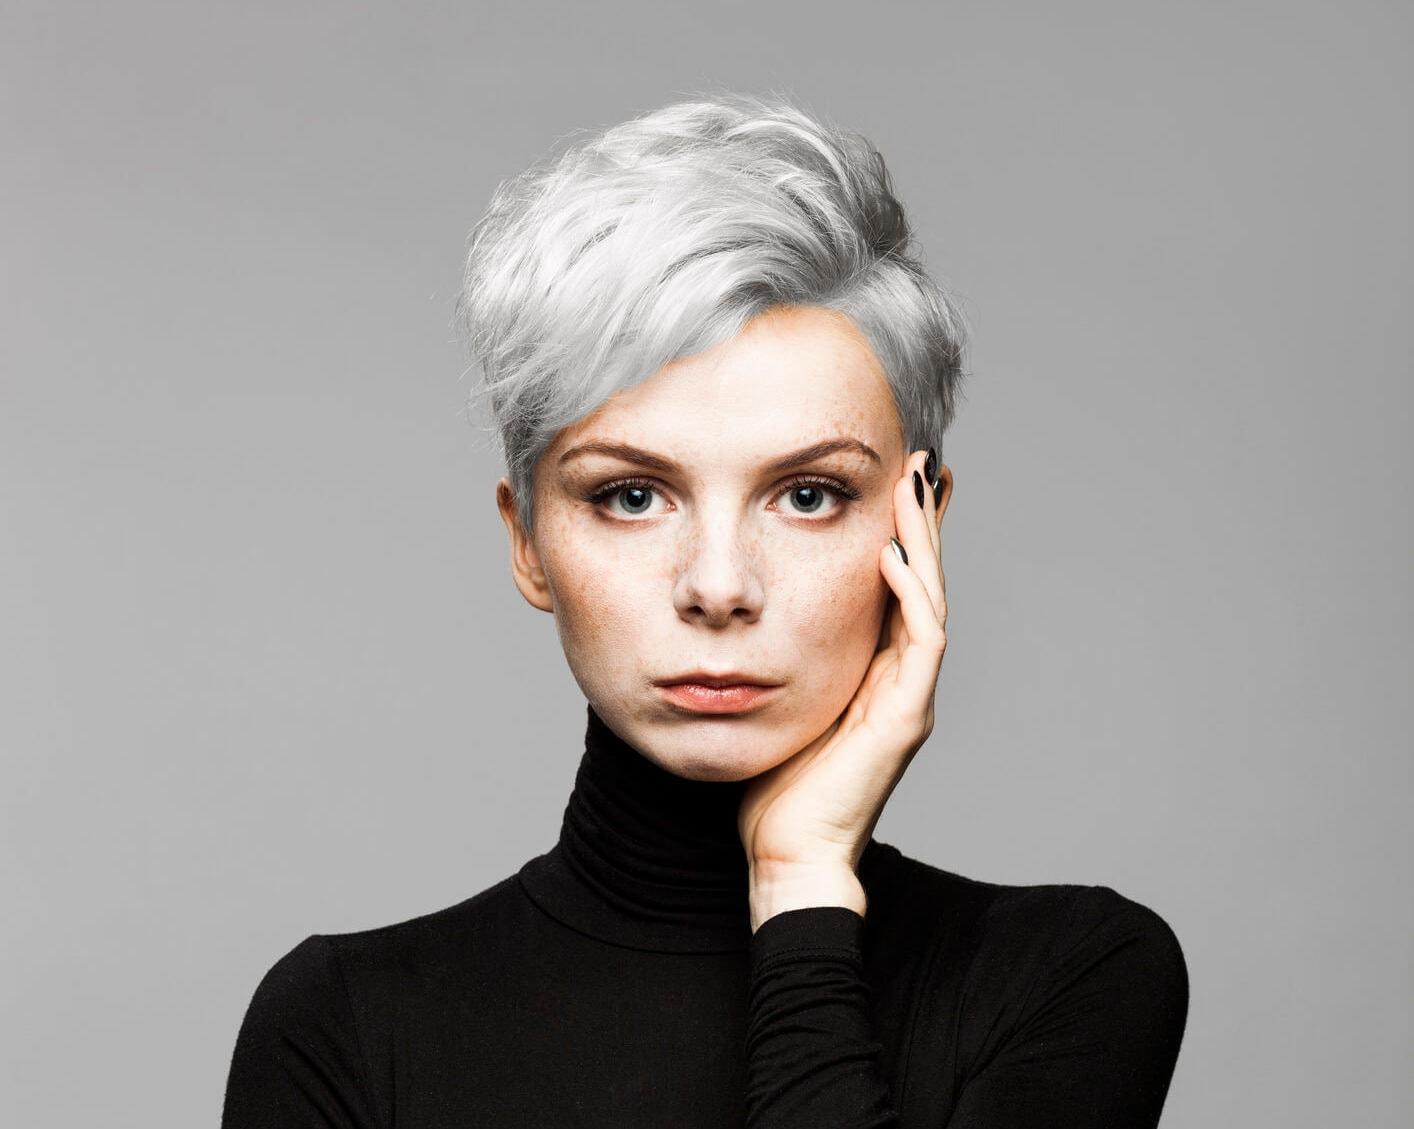 cabello gris pixie platino